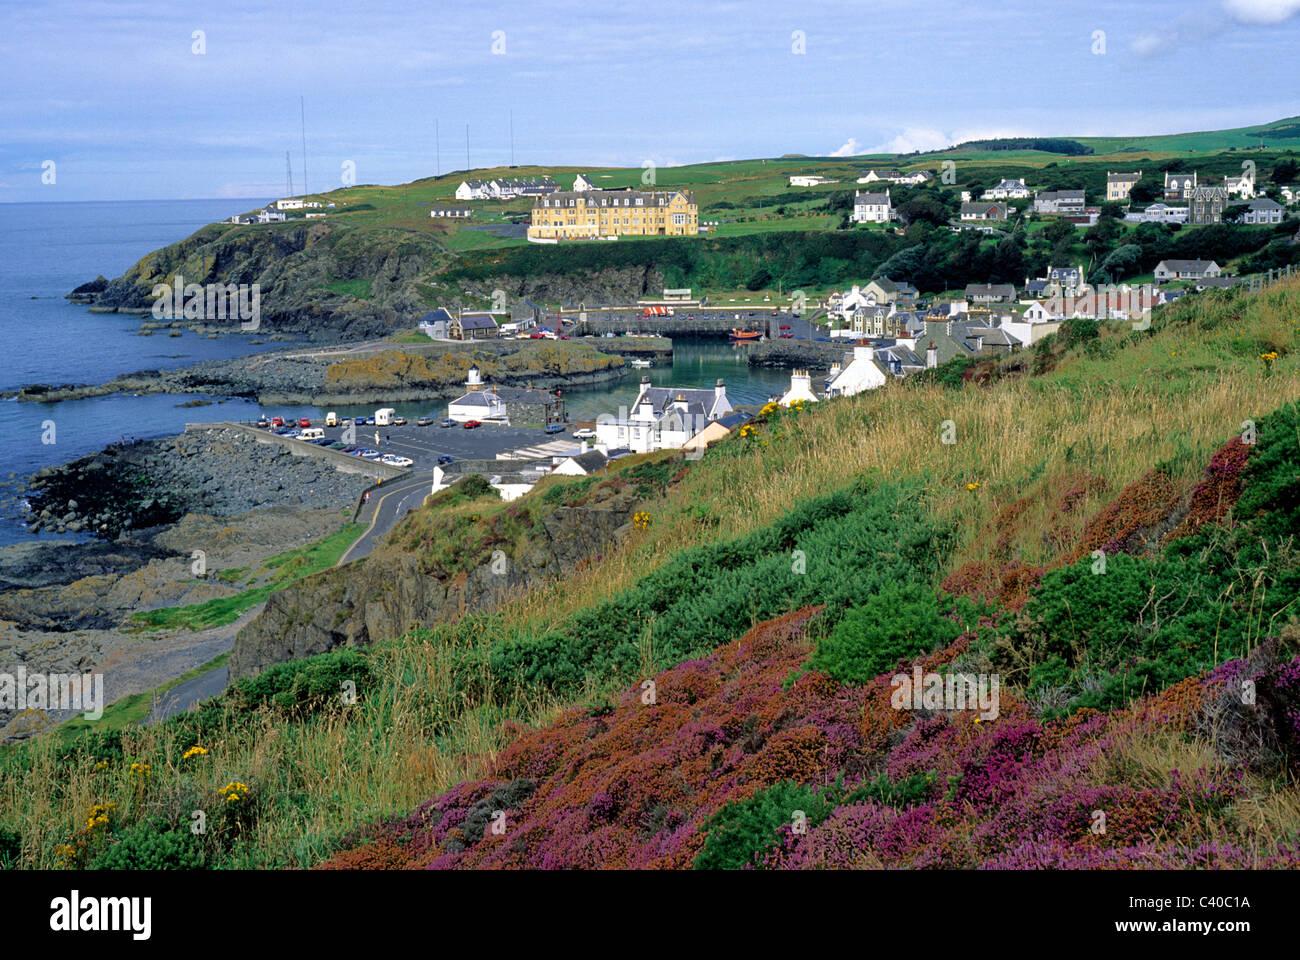 Portpatrick, Dumfries and Galloway Region, Scotland Scottish coast